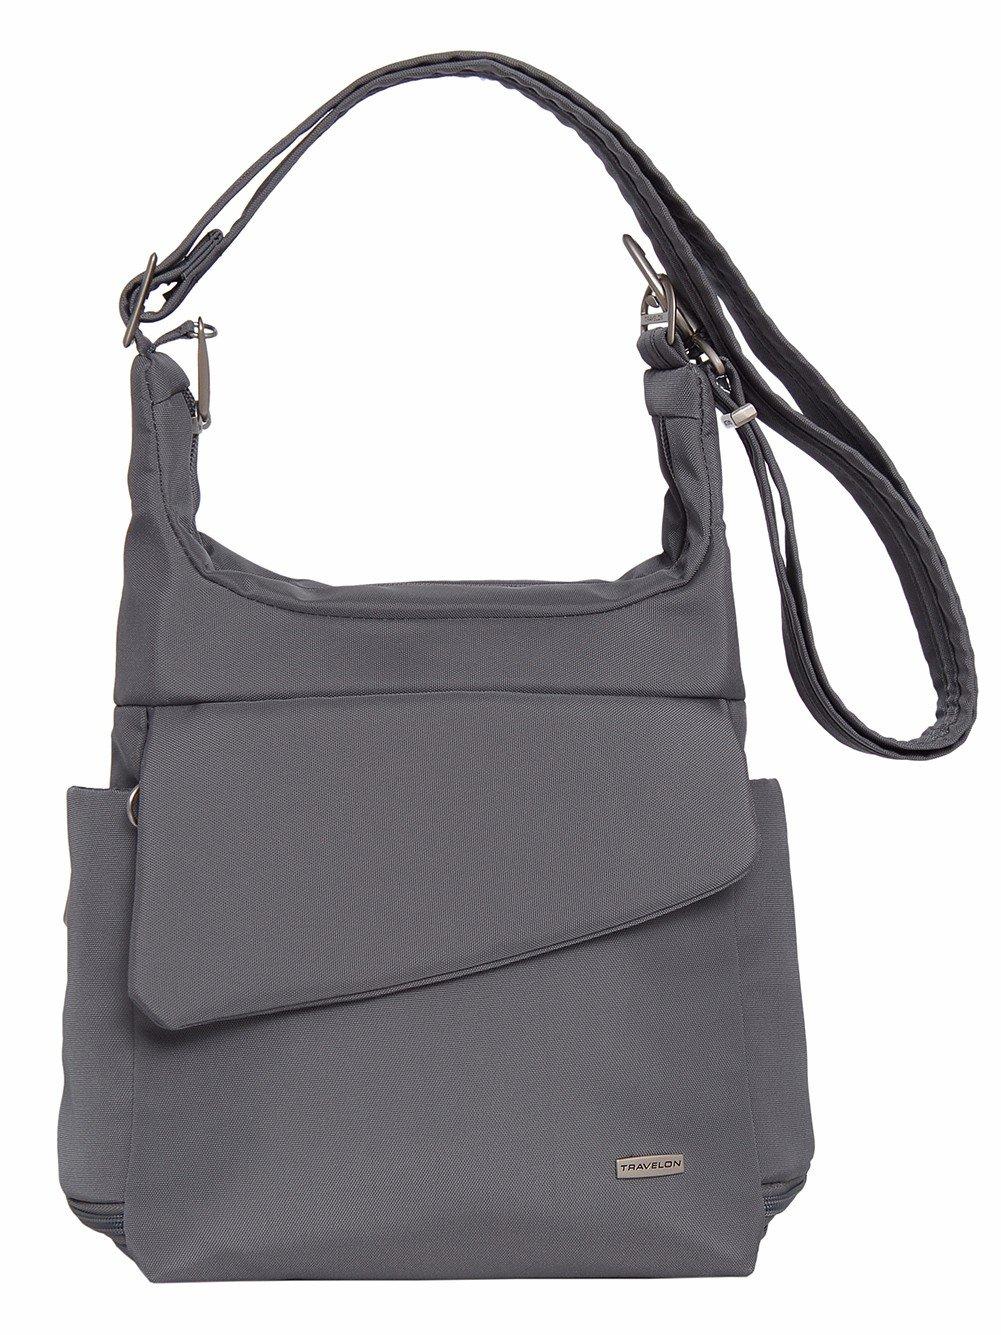 Travelon Anti-Theft Messenger Bag (DARK GREY)